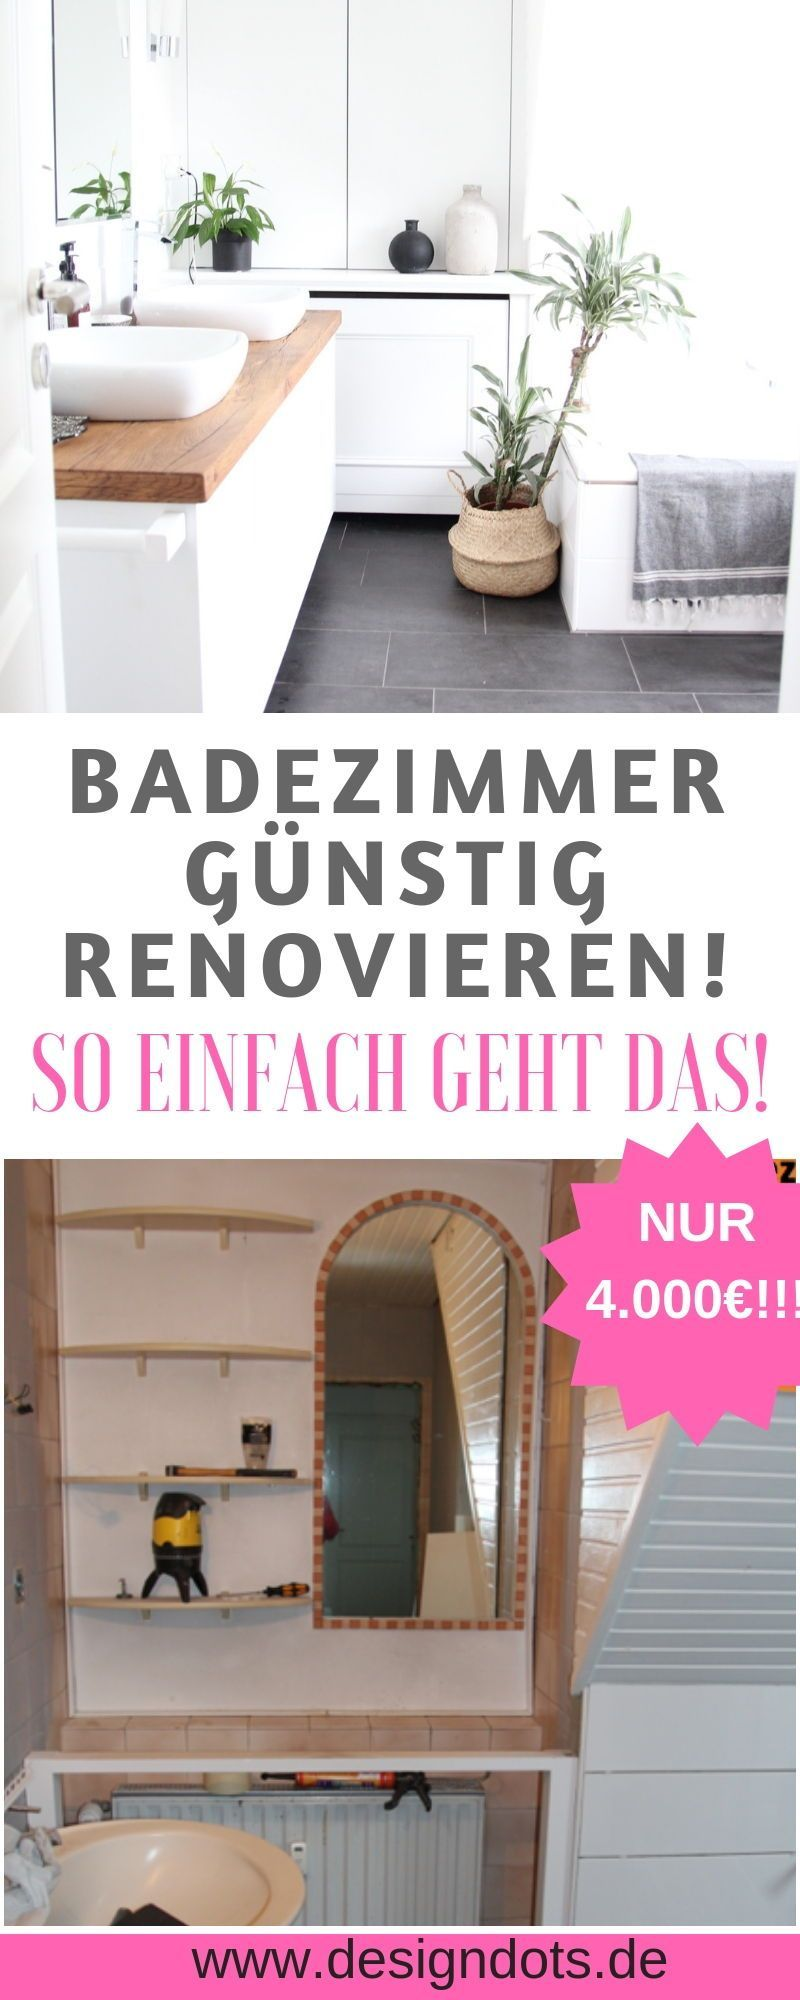 Badezimmer Ideen Badezimmer Fliesen Badezimmer D In 2020